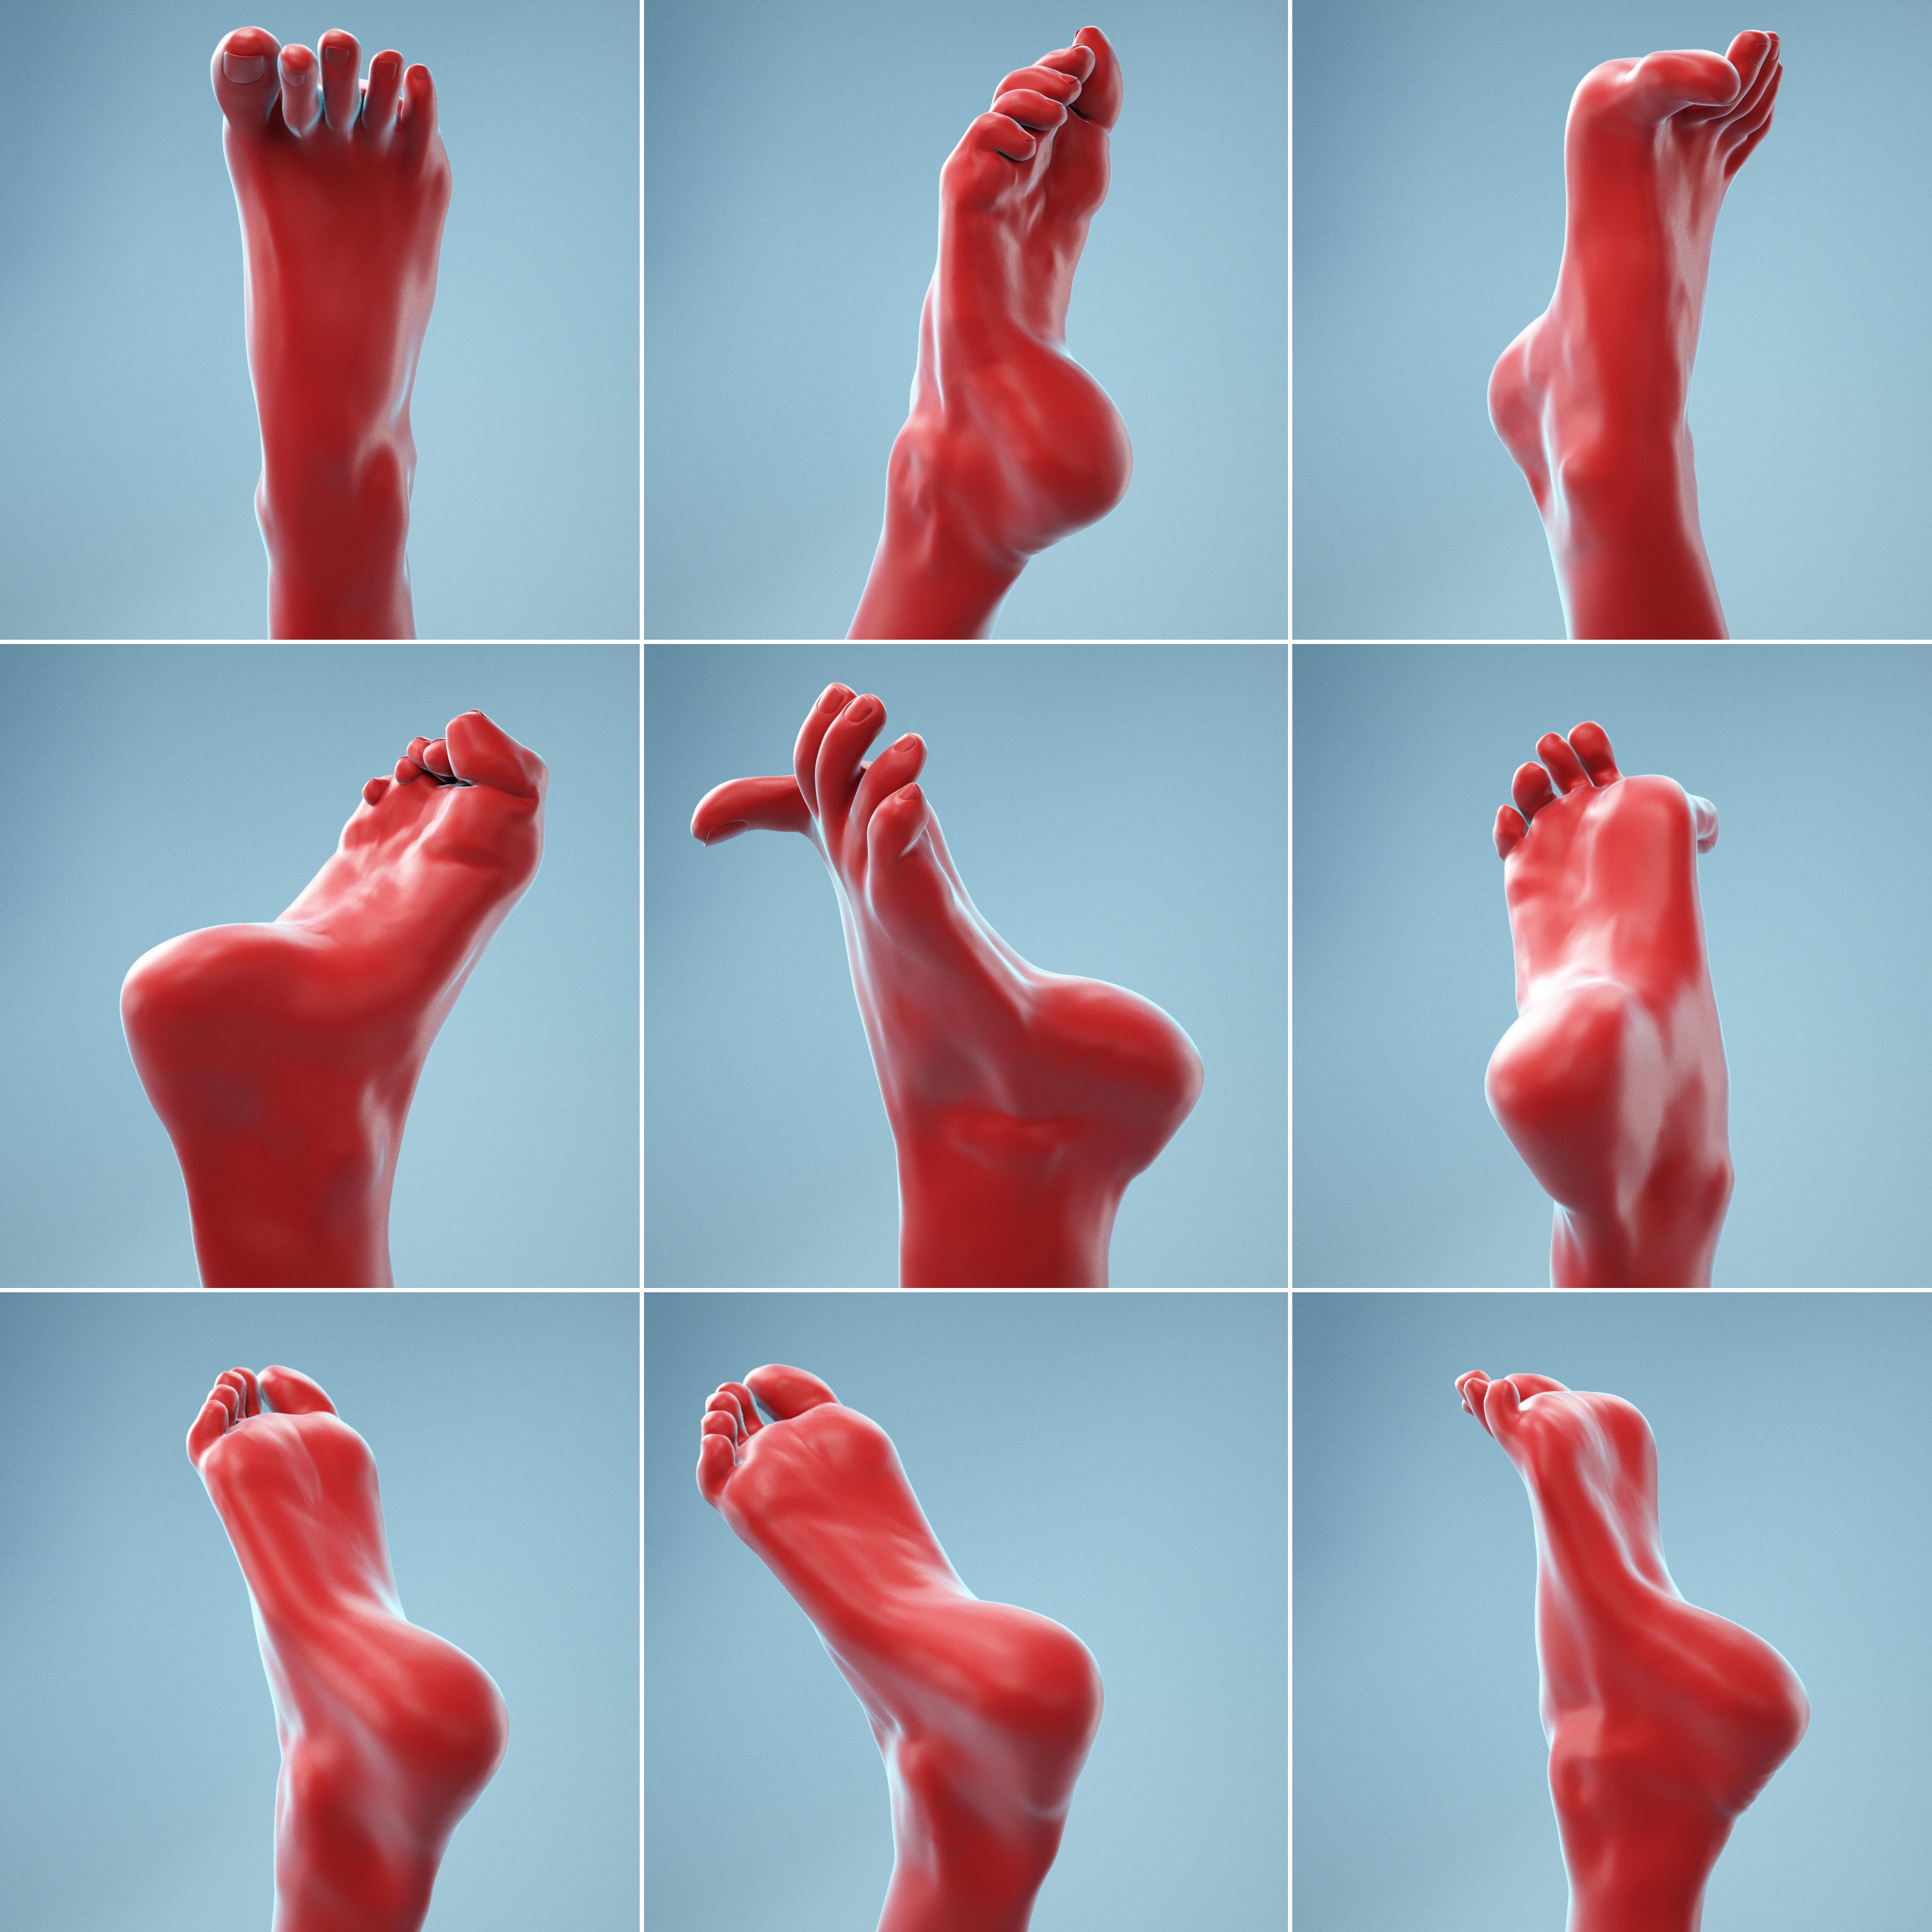 7 Realistic Photoscanned Feet